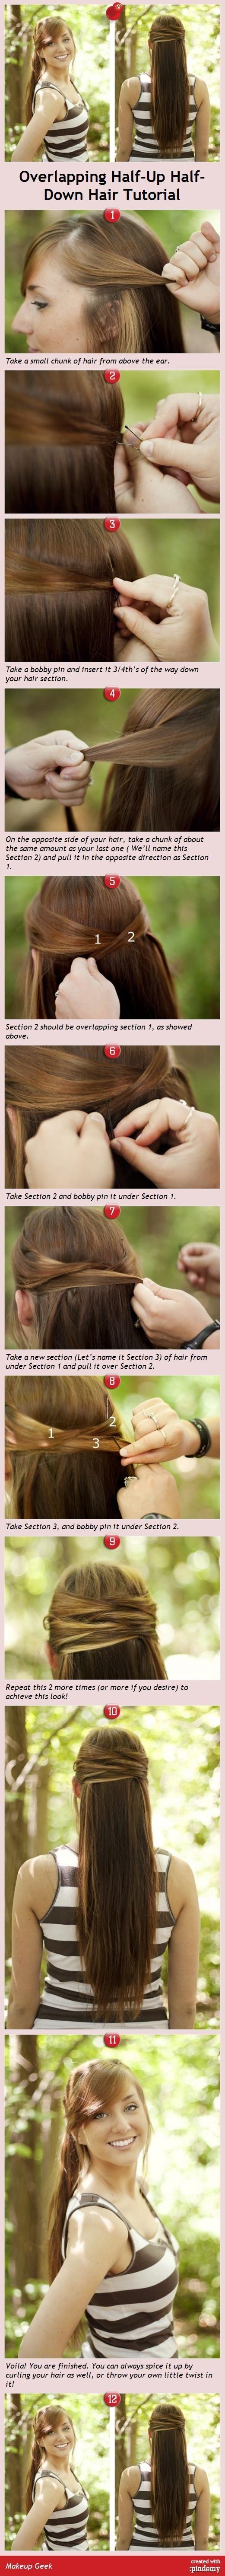 Overlapping Half-Up Half-Down Hair Tutorial -